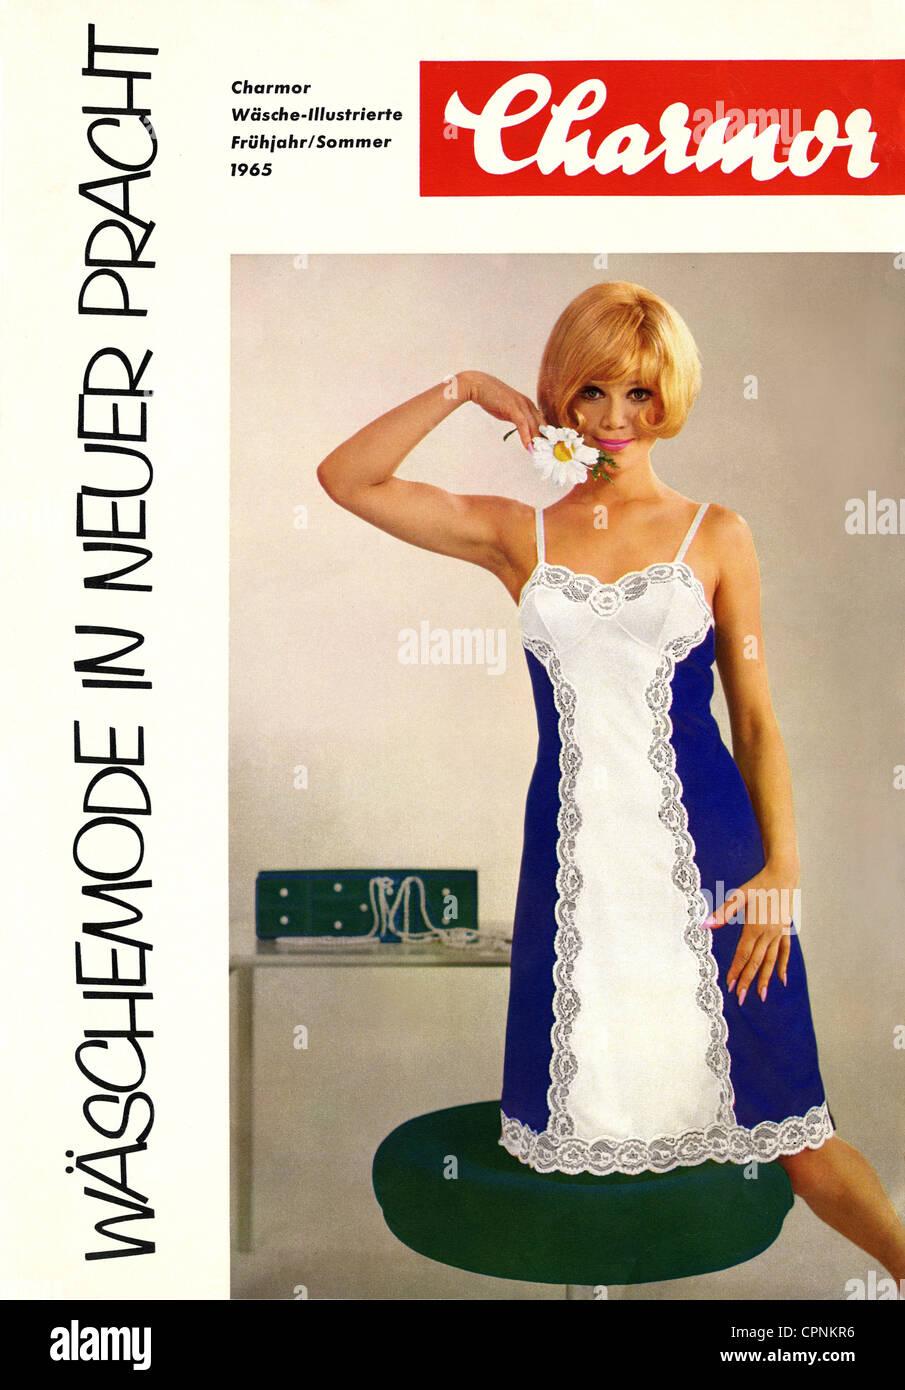 a3414e11c32 advertising, fashion, Charmor lingerie fashion, prospectus Stock ...